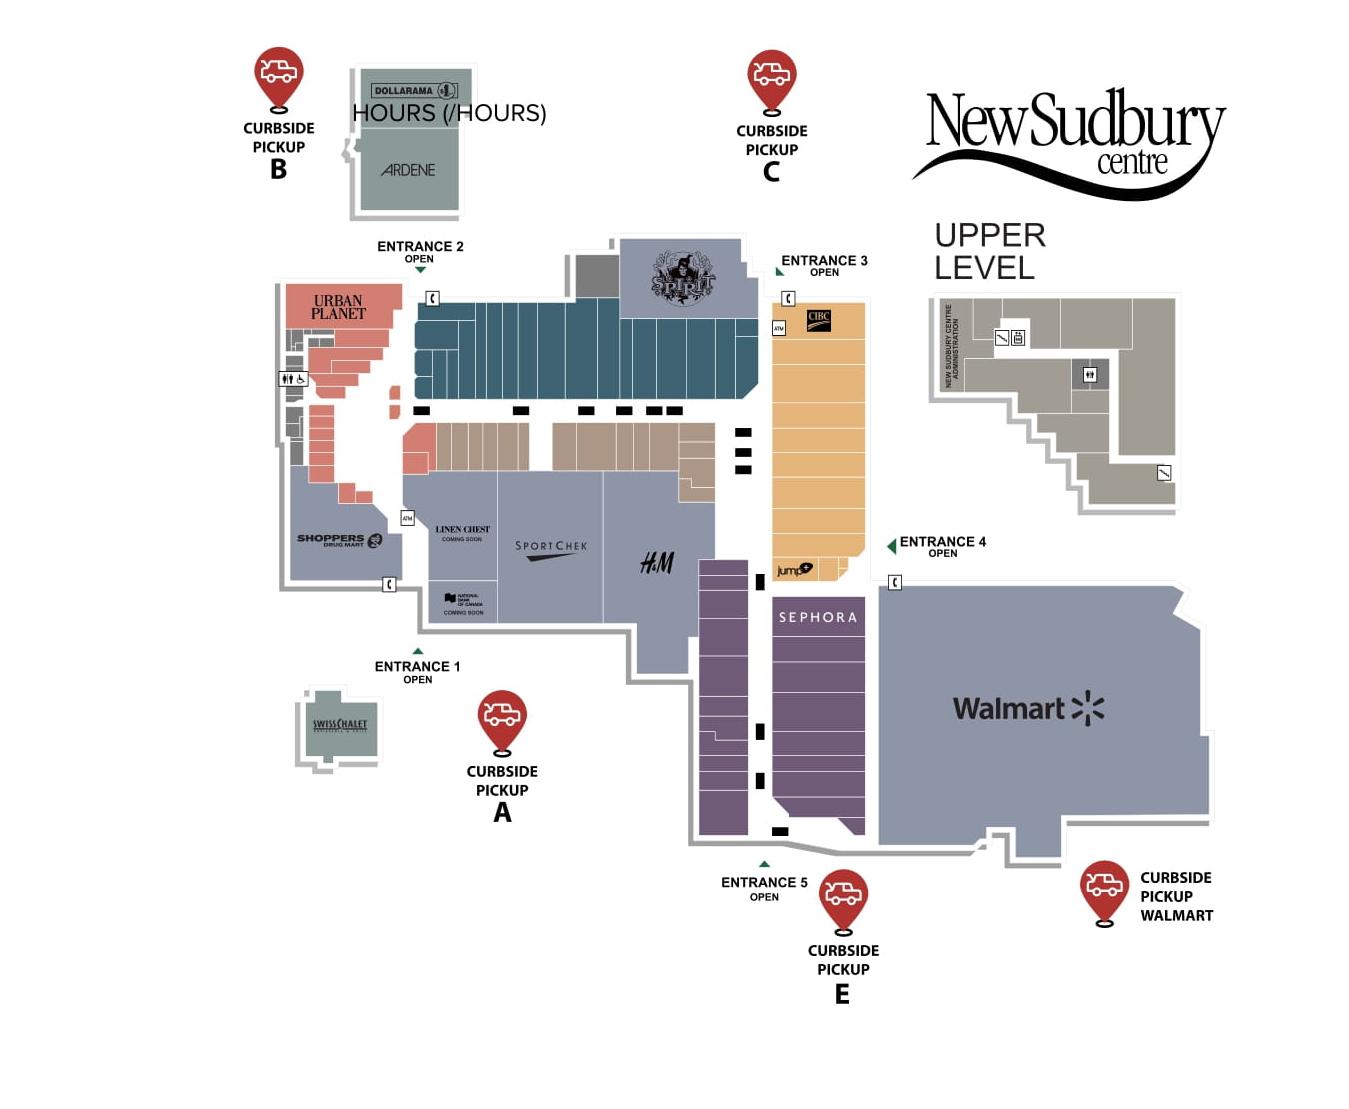 Gps Phone Locator >> New Sudbury Centre in Sudbury, Ontario - 106 stores - (location, hours, store list) | Shopping ...